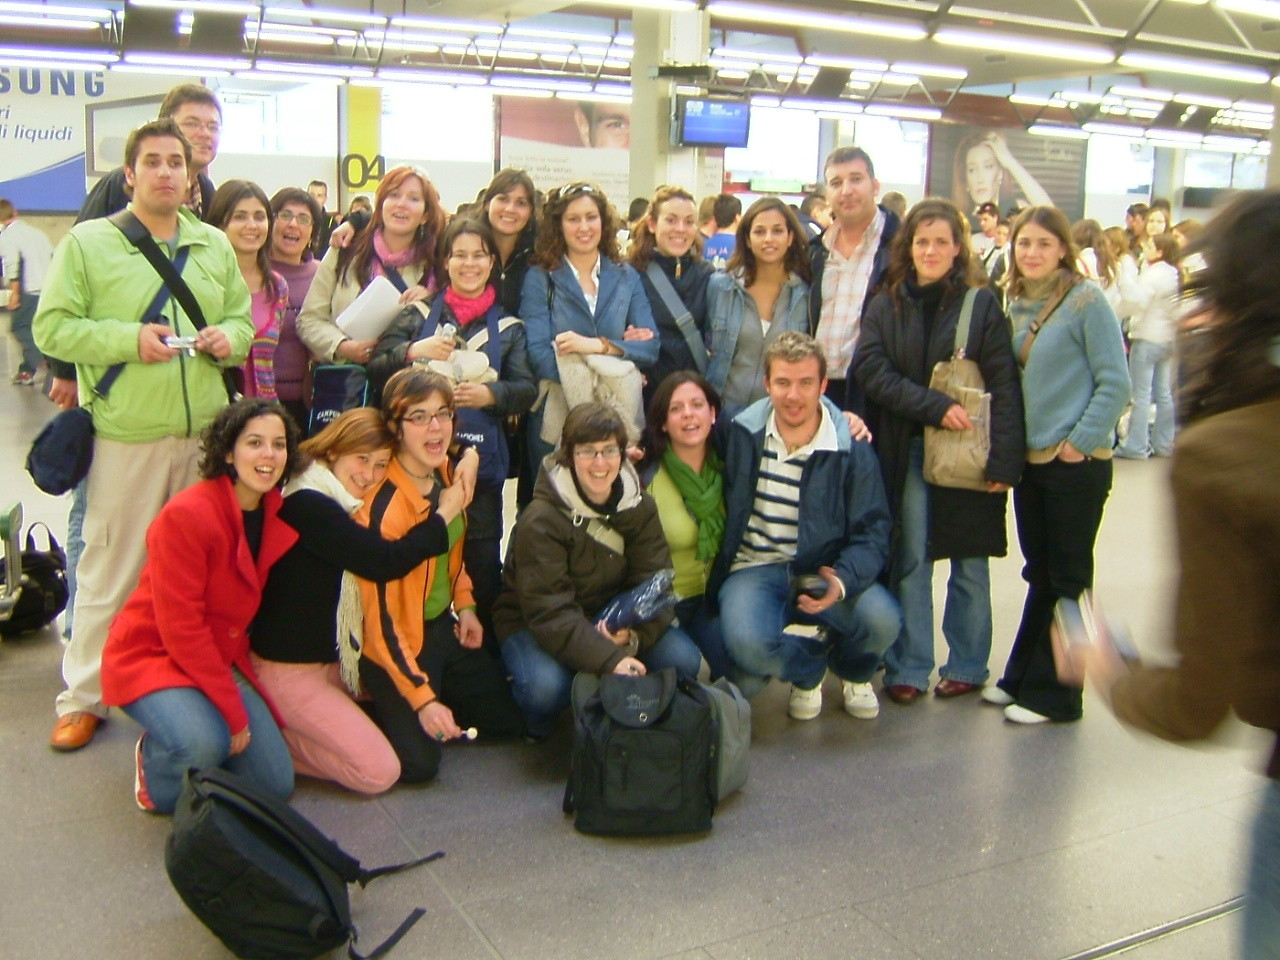 2004. Salida aeropuerto